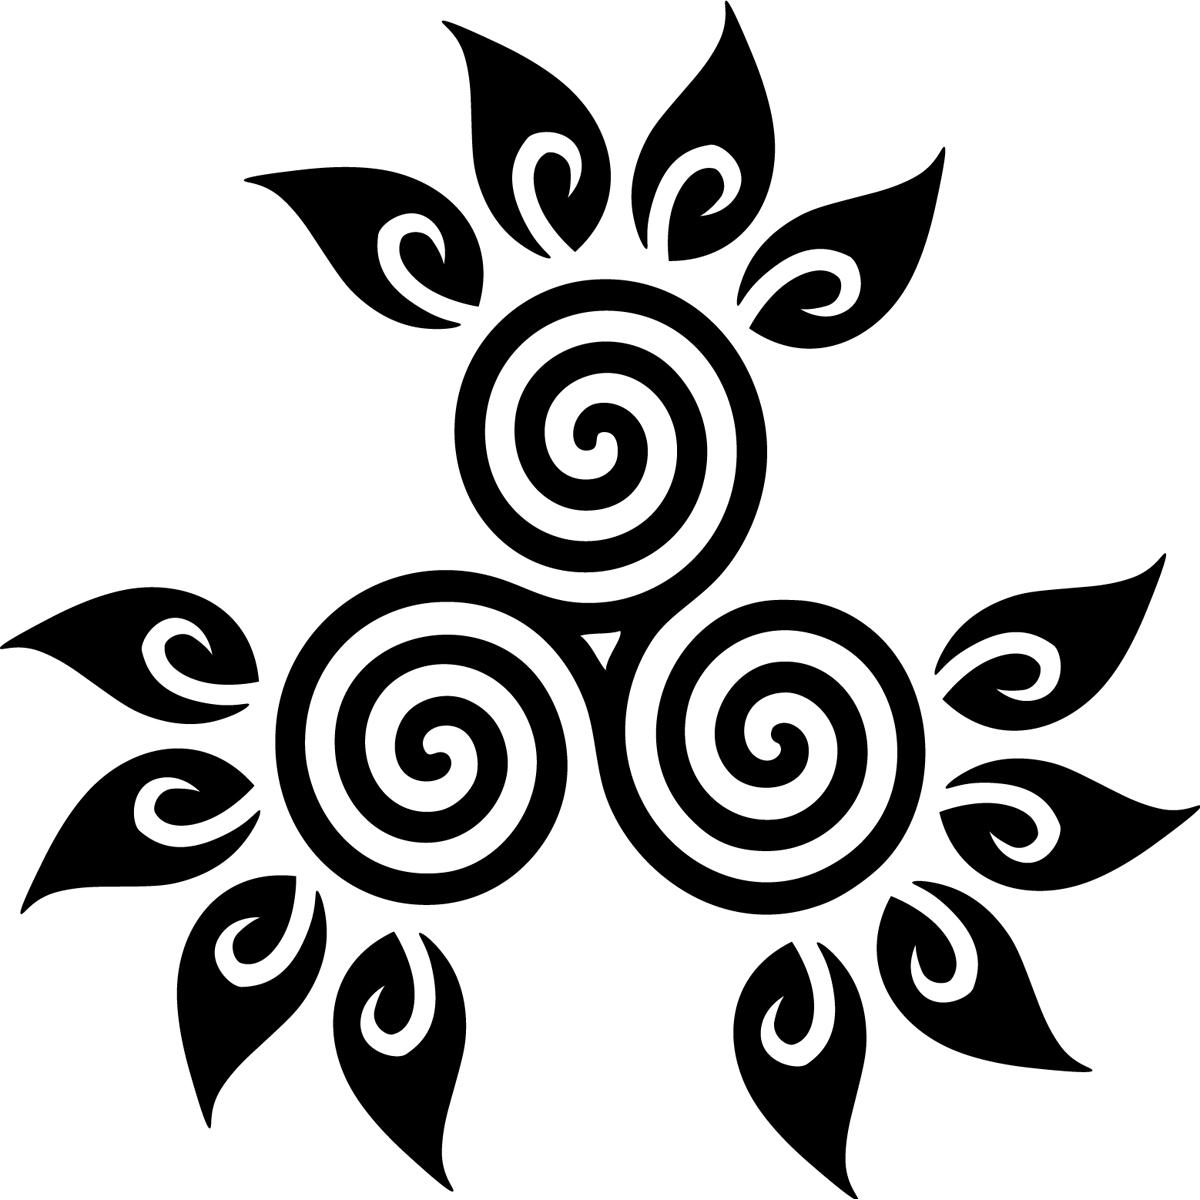 stickers muraux design design circulaire et feuilles ambiance. Black Bedroom Furniture Sets. Home Design Ideas